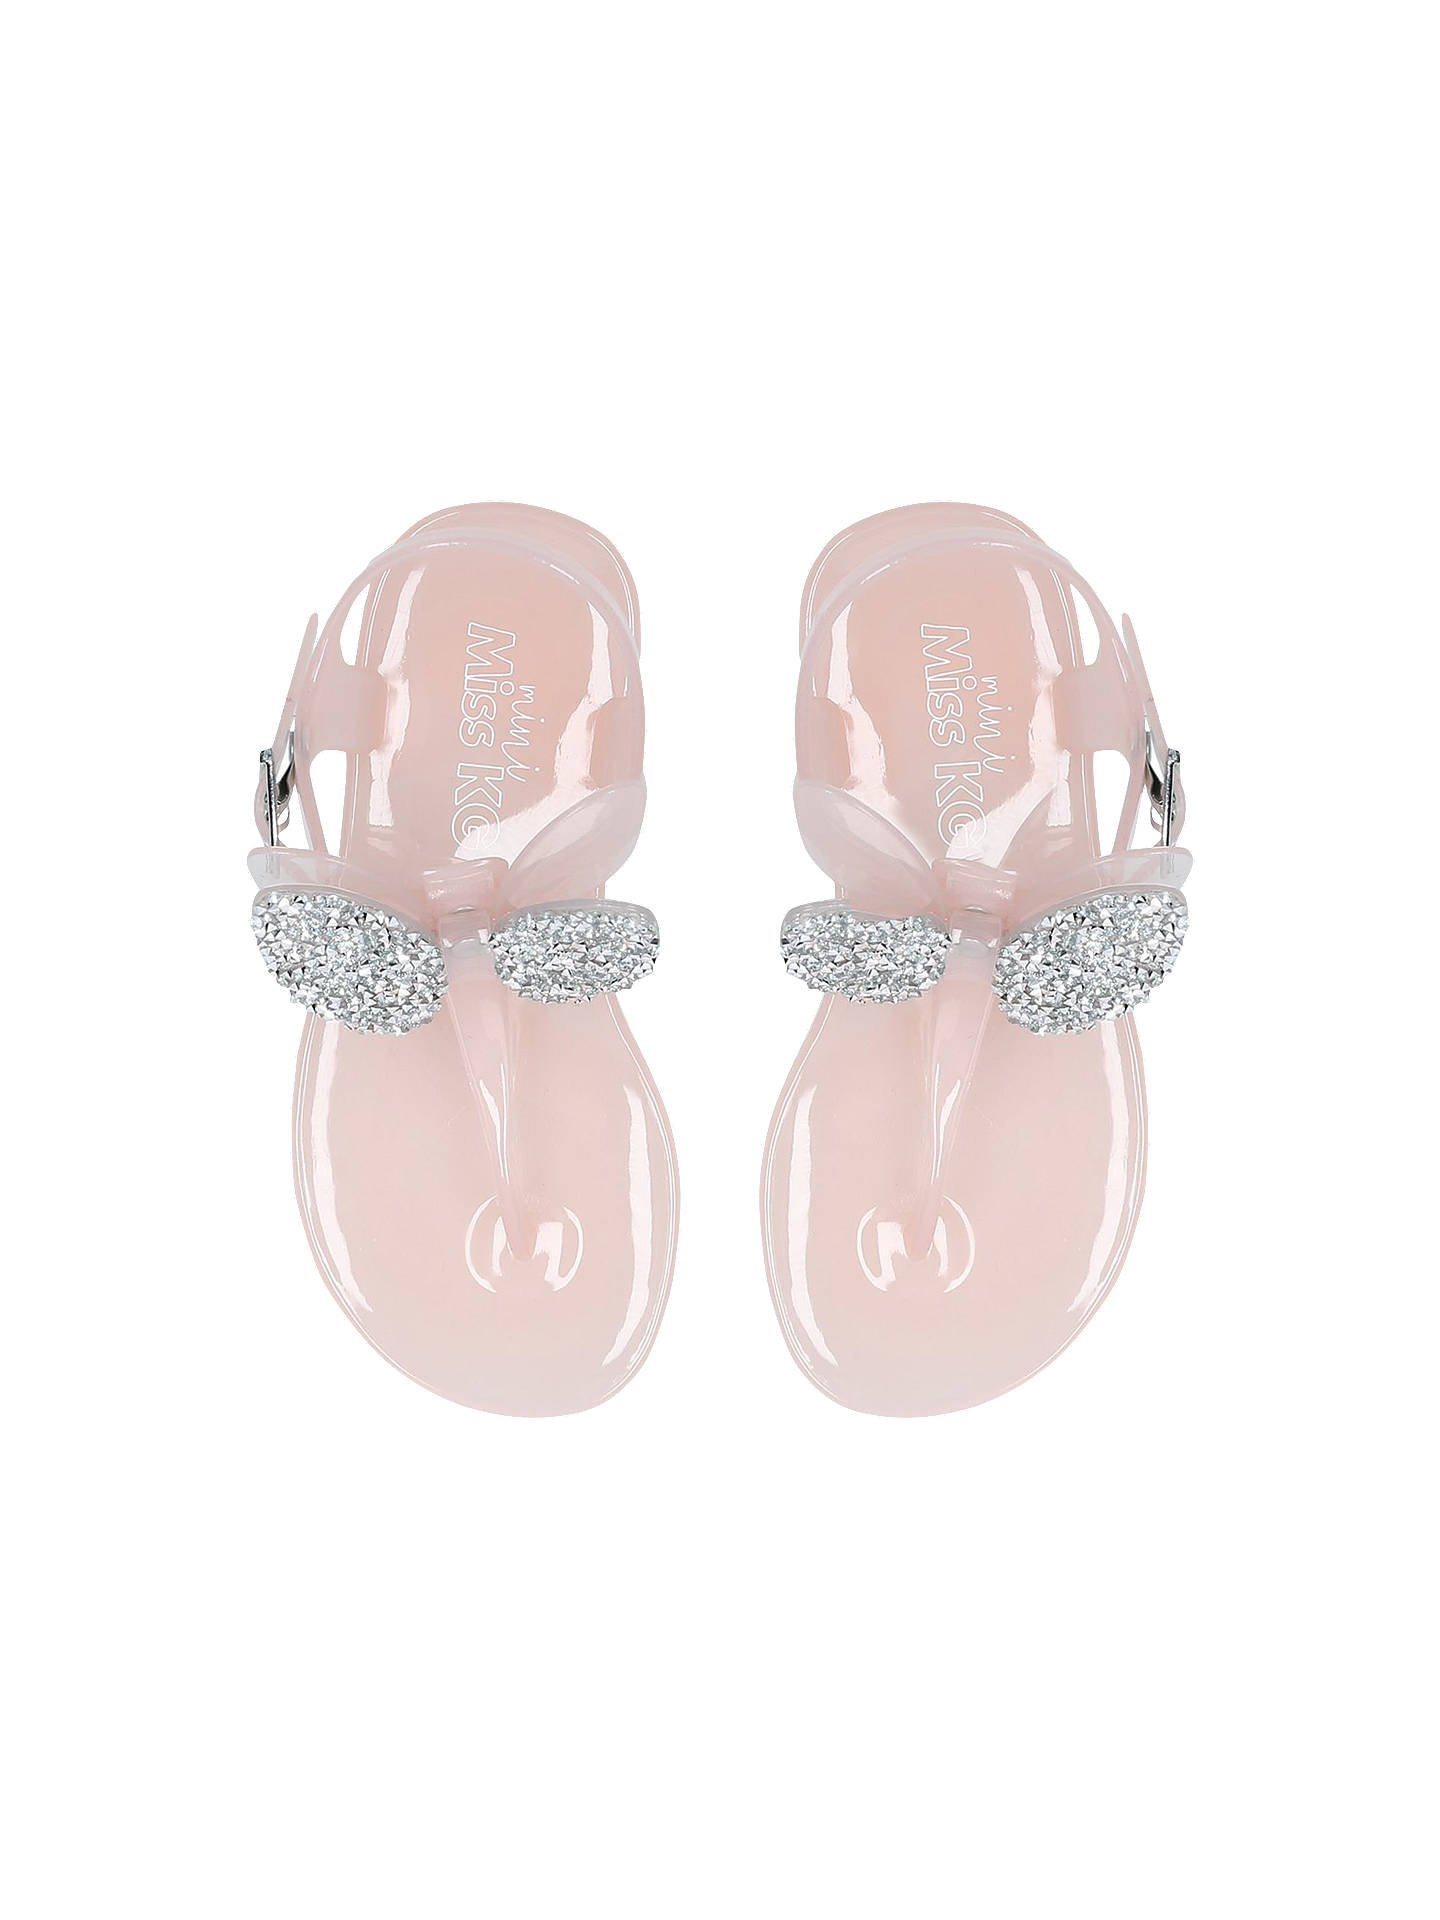 5767665006c1 Buy Kurt Geiger London Children s Dina Sandals